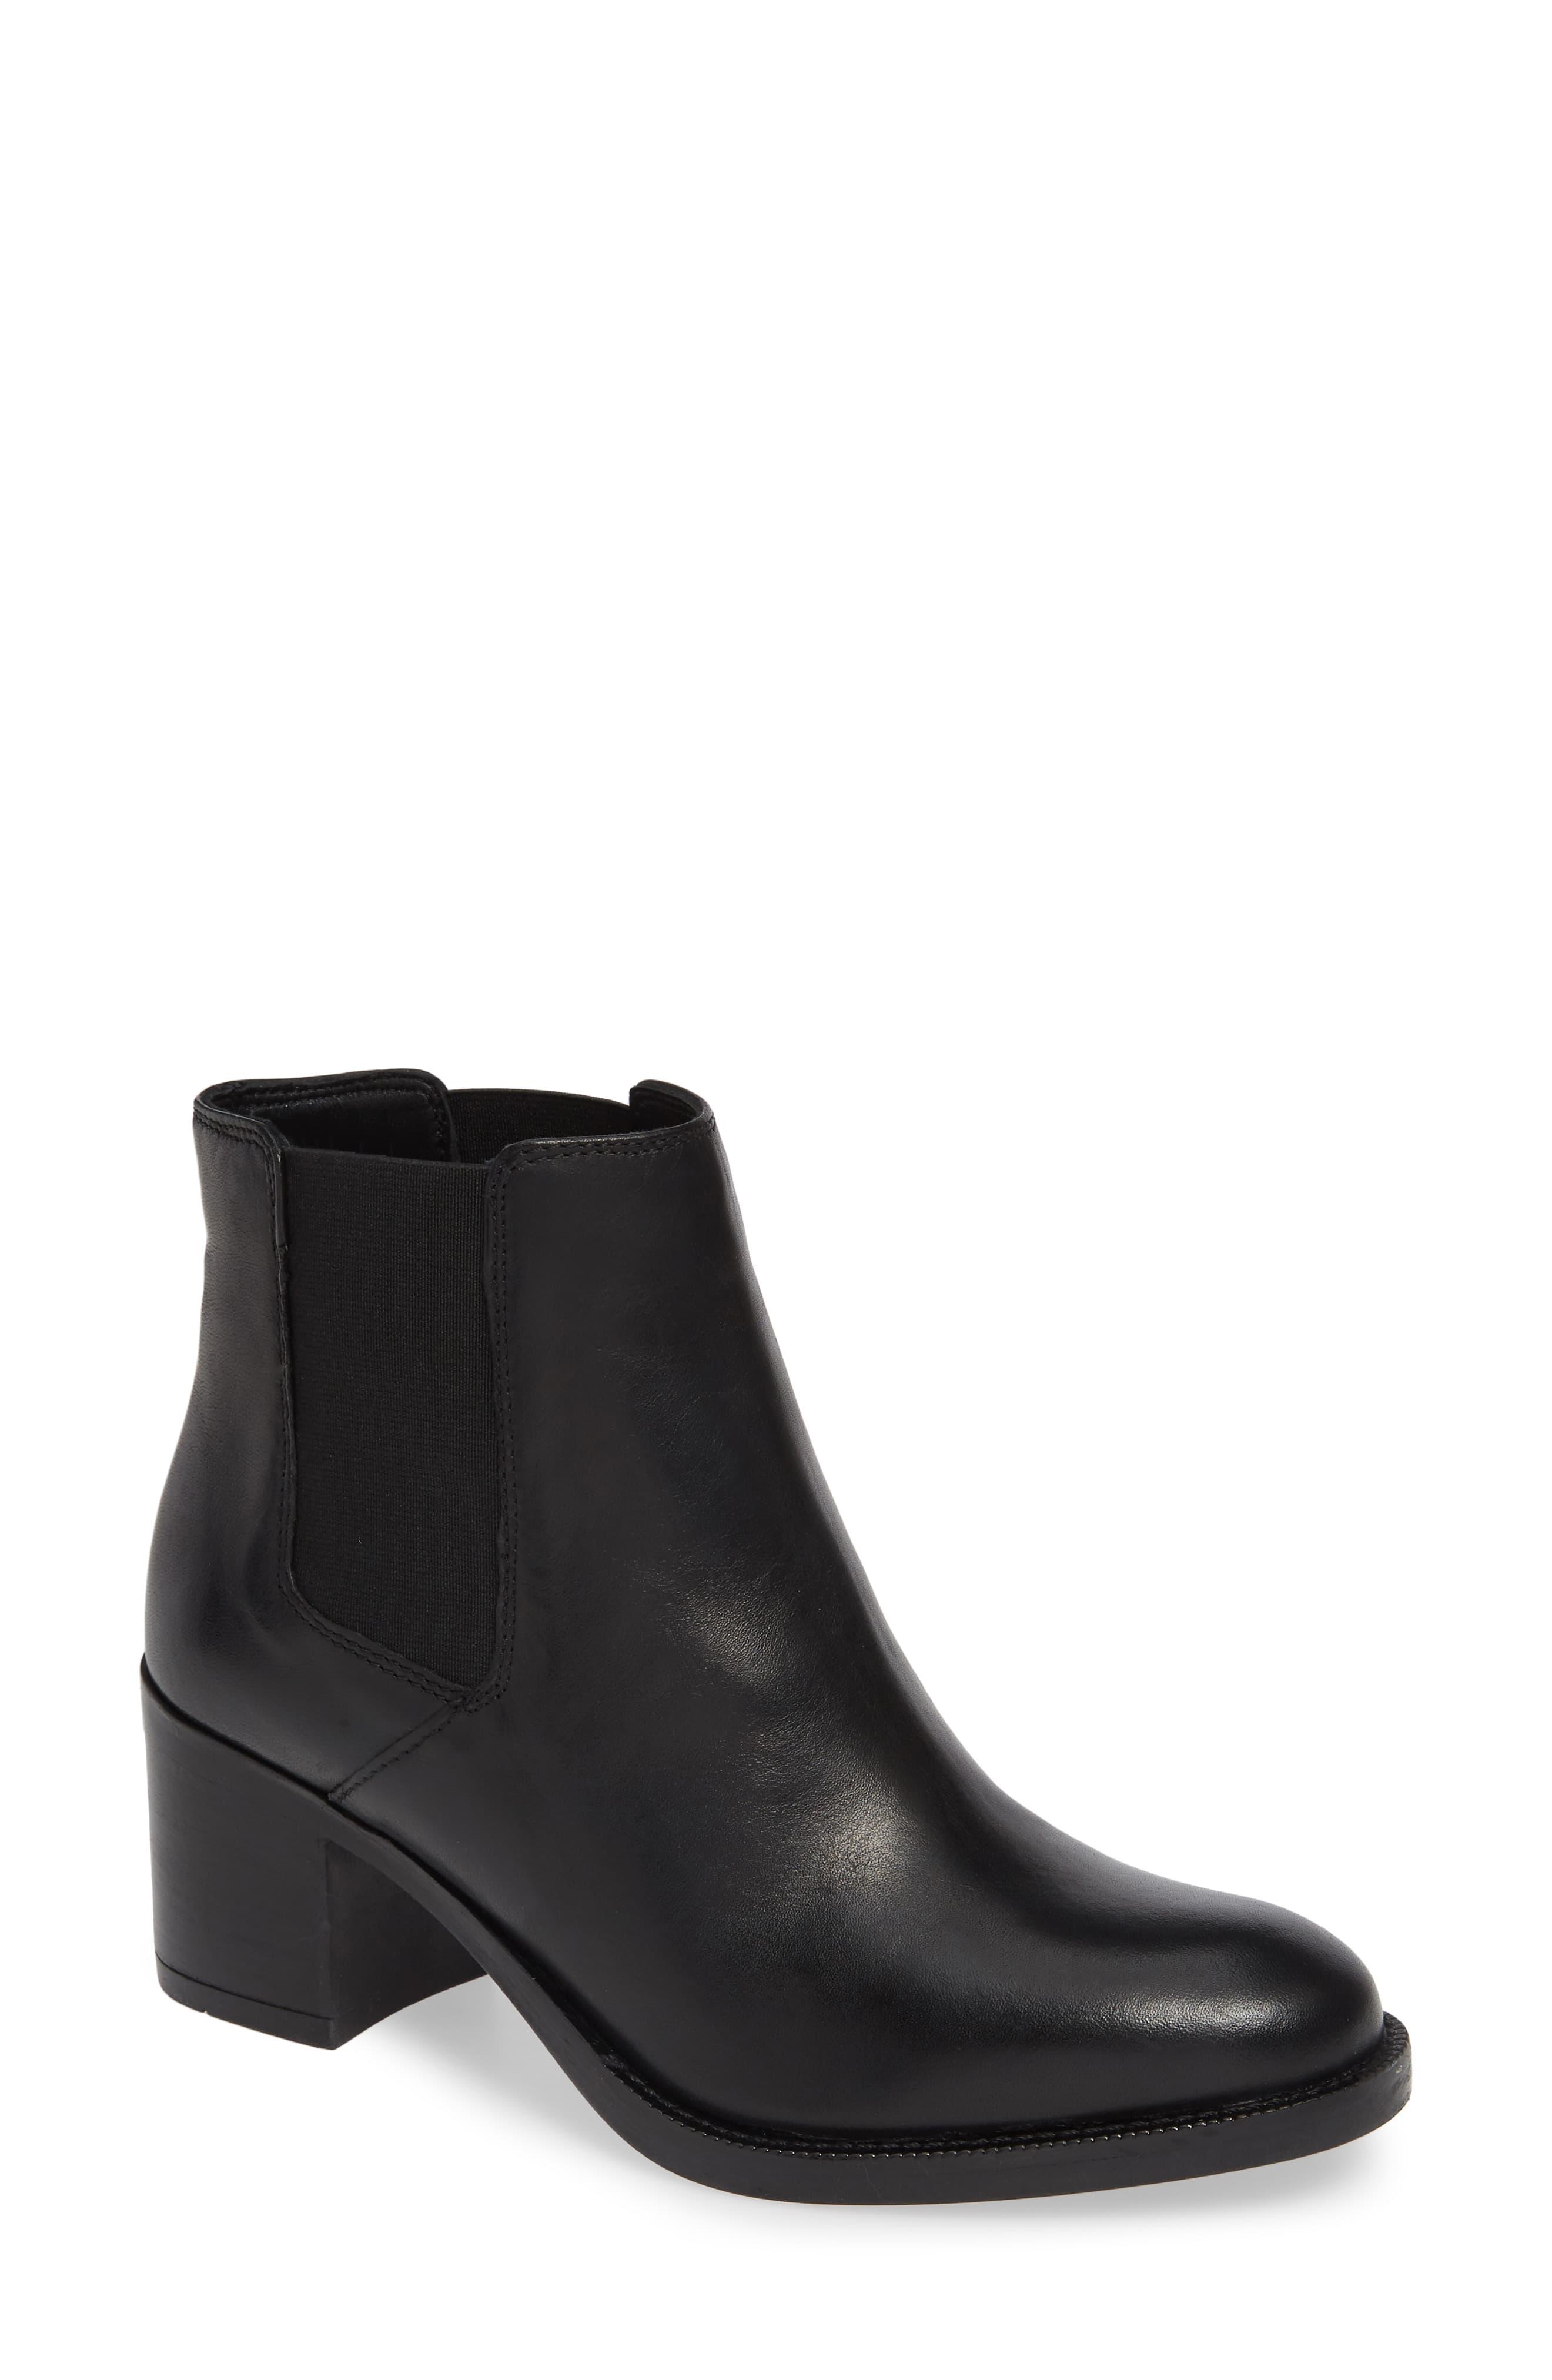 65c1944adc8 Women's Clarks Mascarpone Bay Chelsea Boot, Size 6 M - Black in 2019 ...